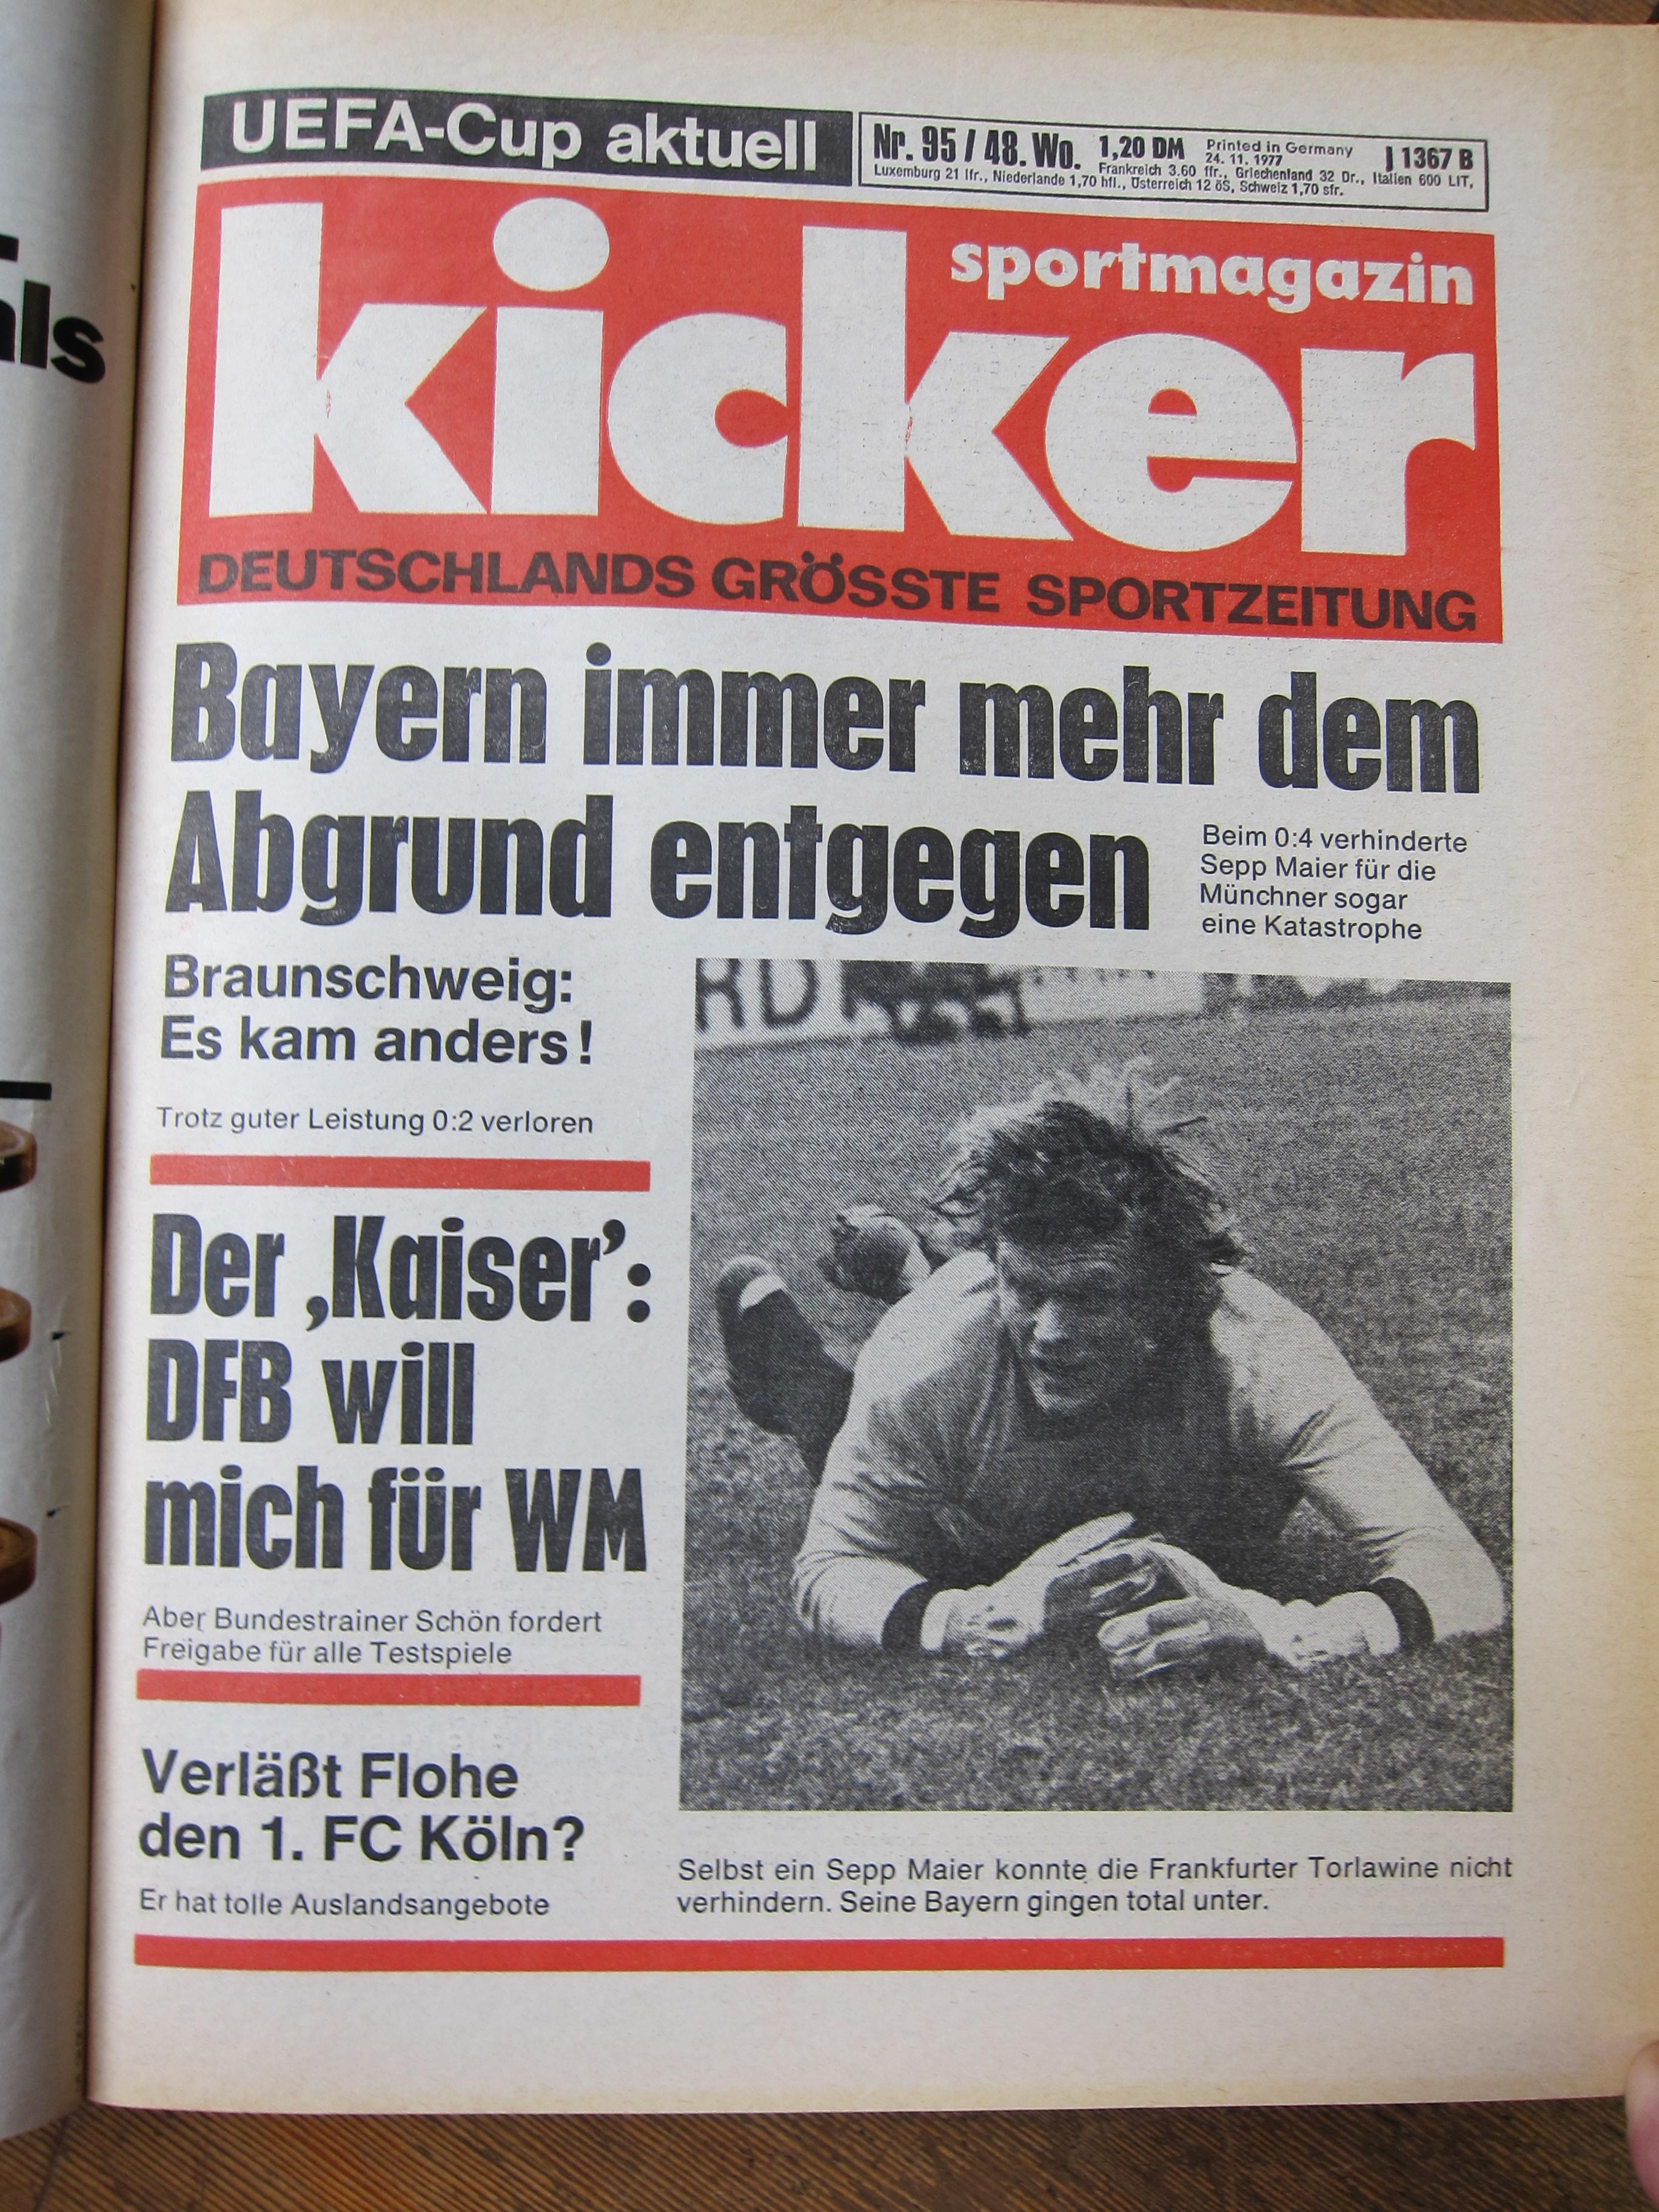 HSV vs. BAYERN MÜNCHEN – ZWEI RÜCKBLICKE